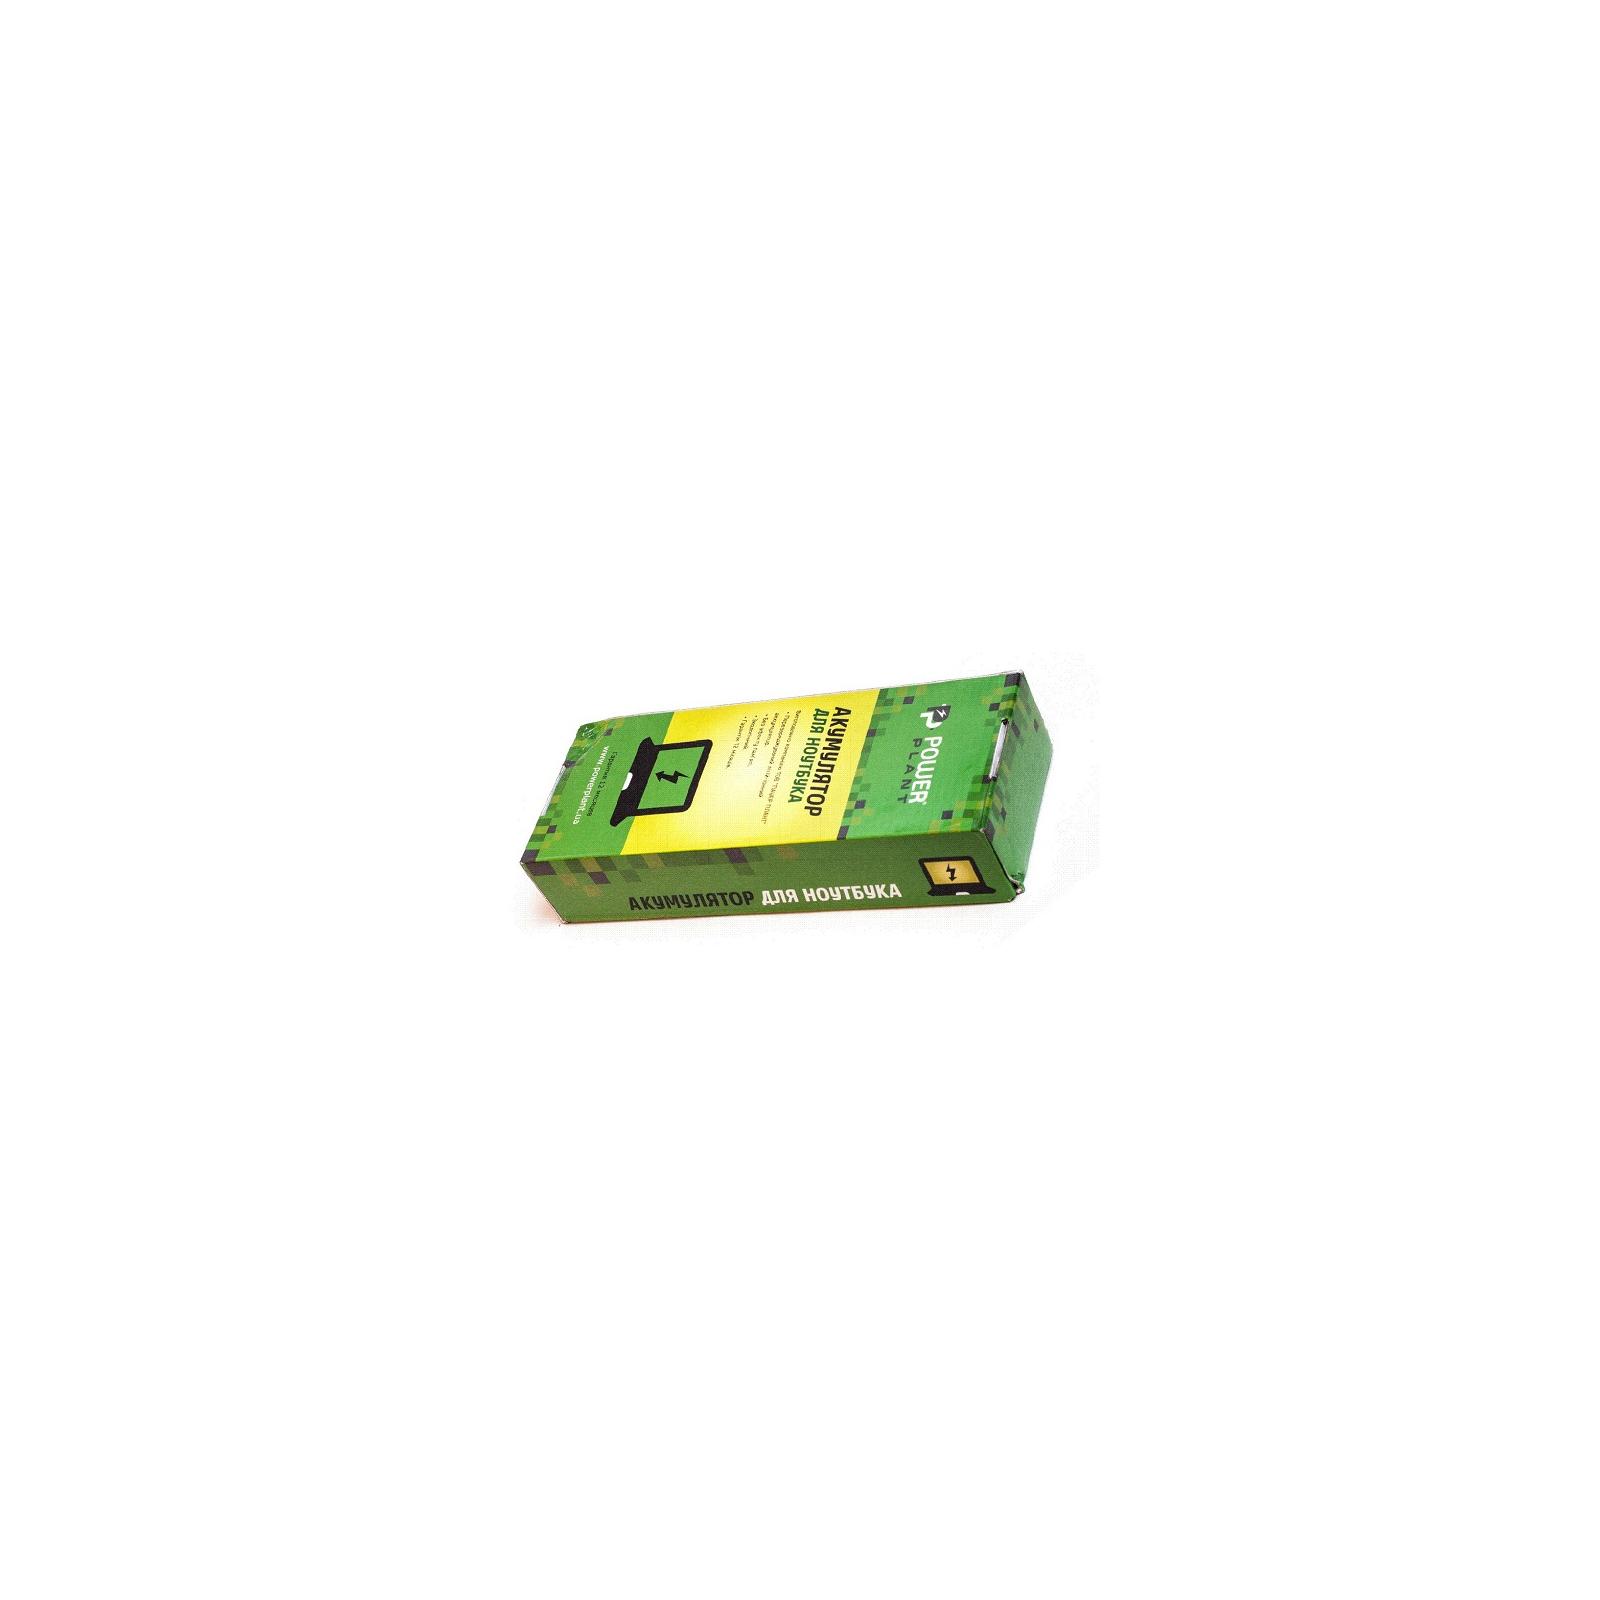 Аккумулятор для ноутбука SONY VAIO PCG-6C1N (VGP-BPS2, SY5651LH) 11.1V 5200mAh PowerPlant (NB00000138) изображение 3